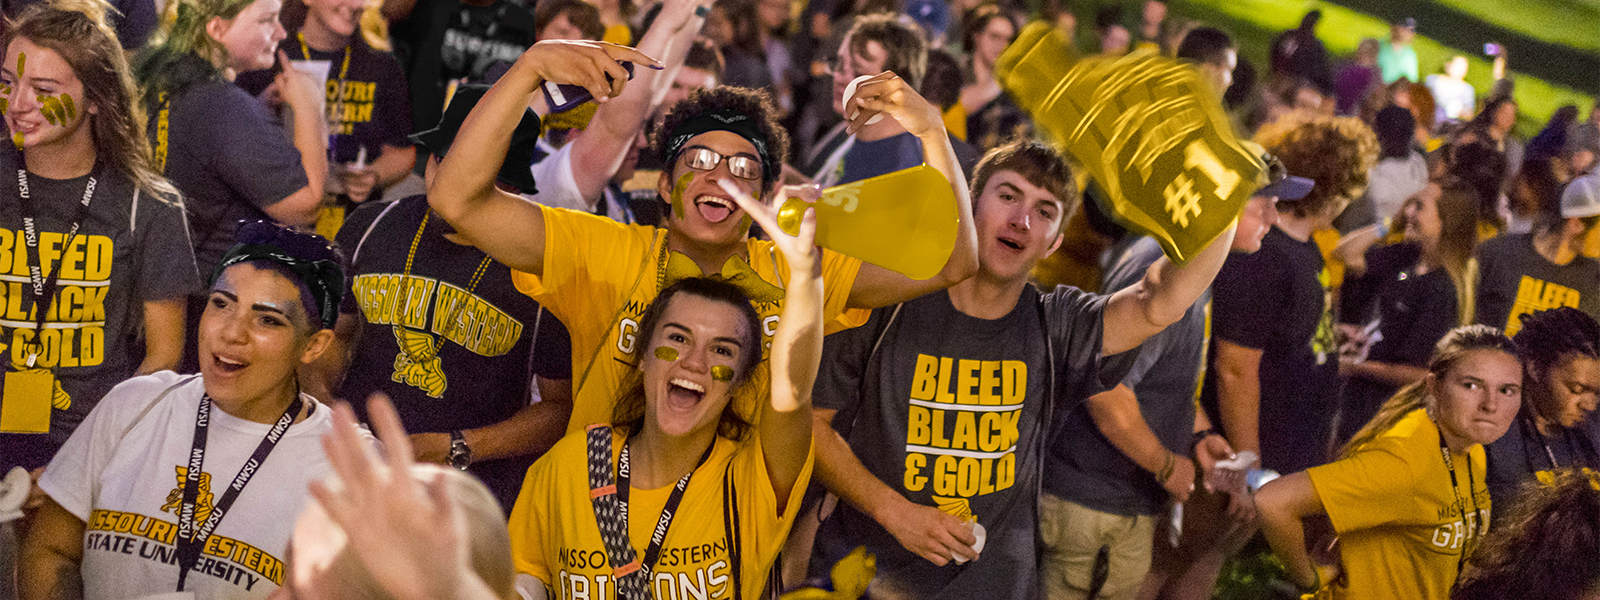 Missouri Western students